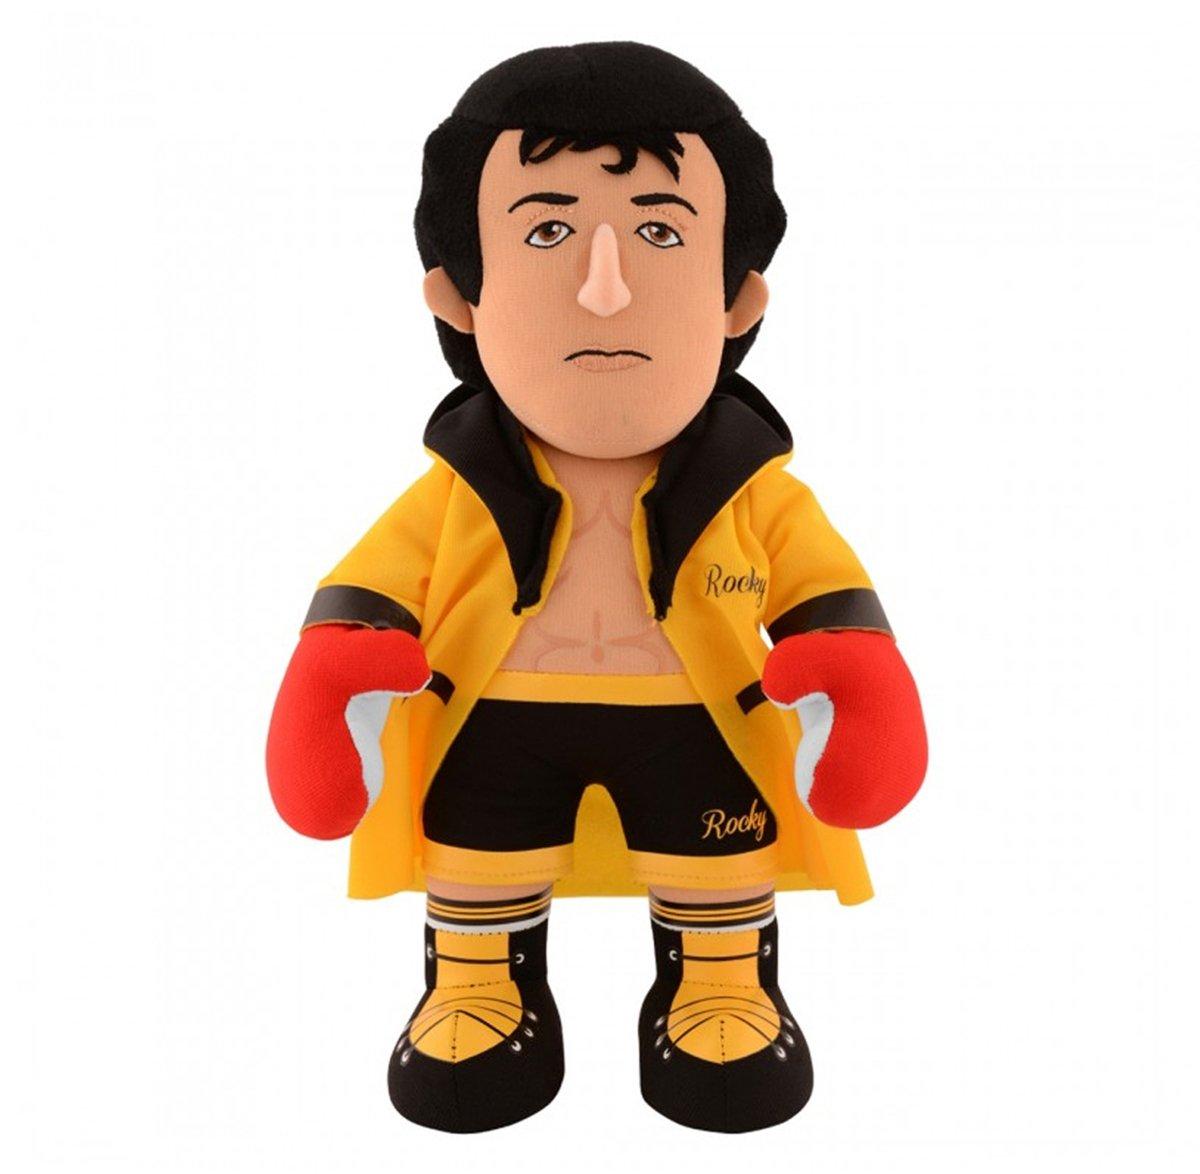 "Rocky Balboa Italian Stallion 10"" Plush Figure - A Movie Legend for Play or Display"